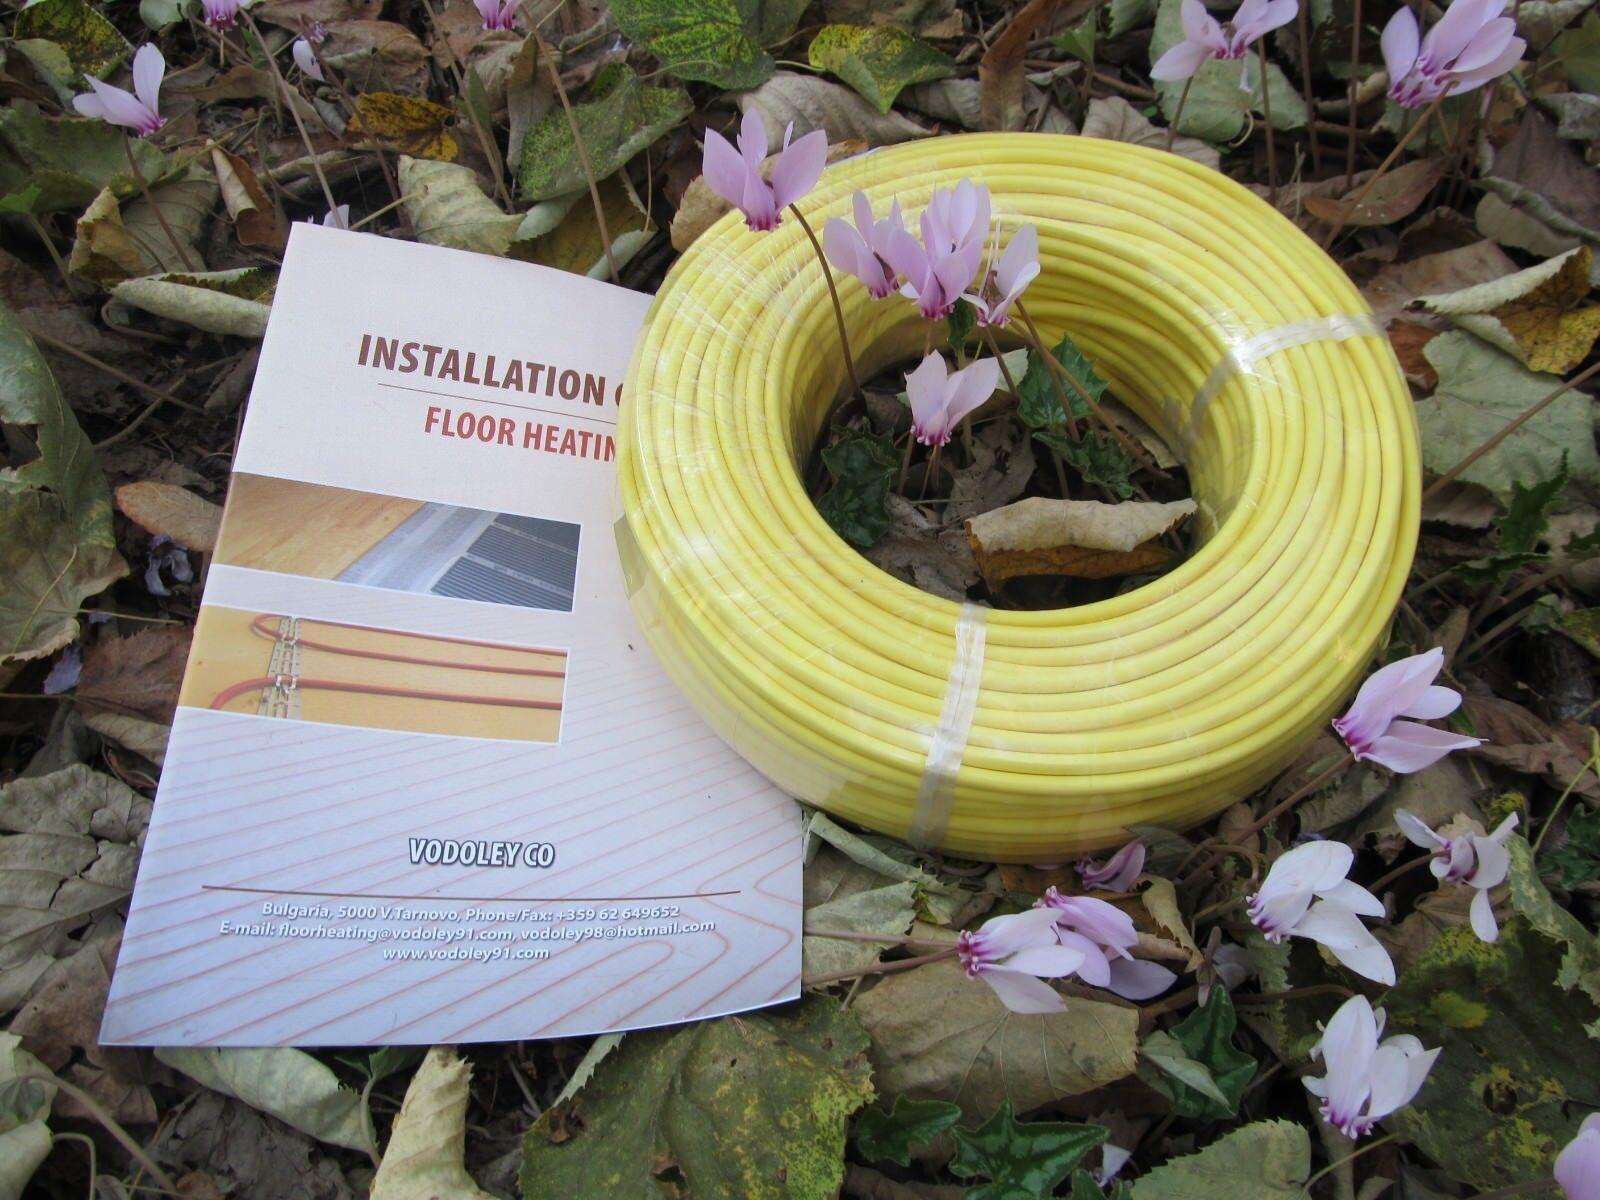 1-1,5sq m 0EMF Warm Tile Under  Floor Heating  cable 200 W 10-15sq.ft 120V